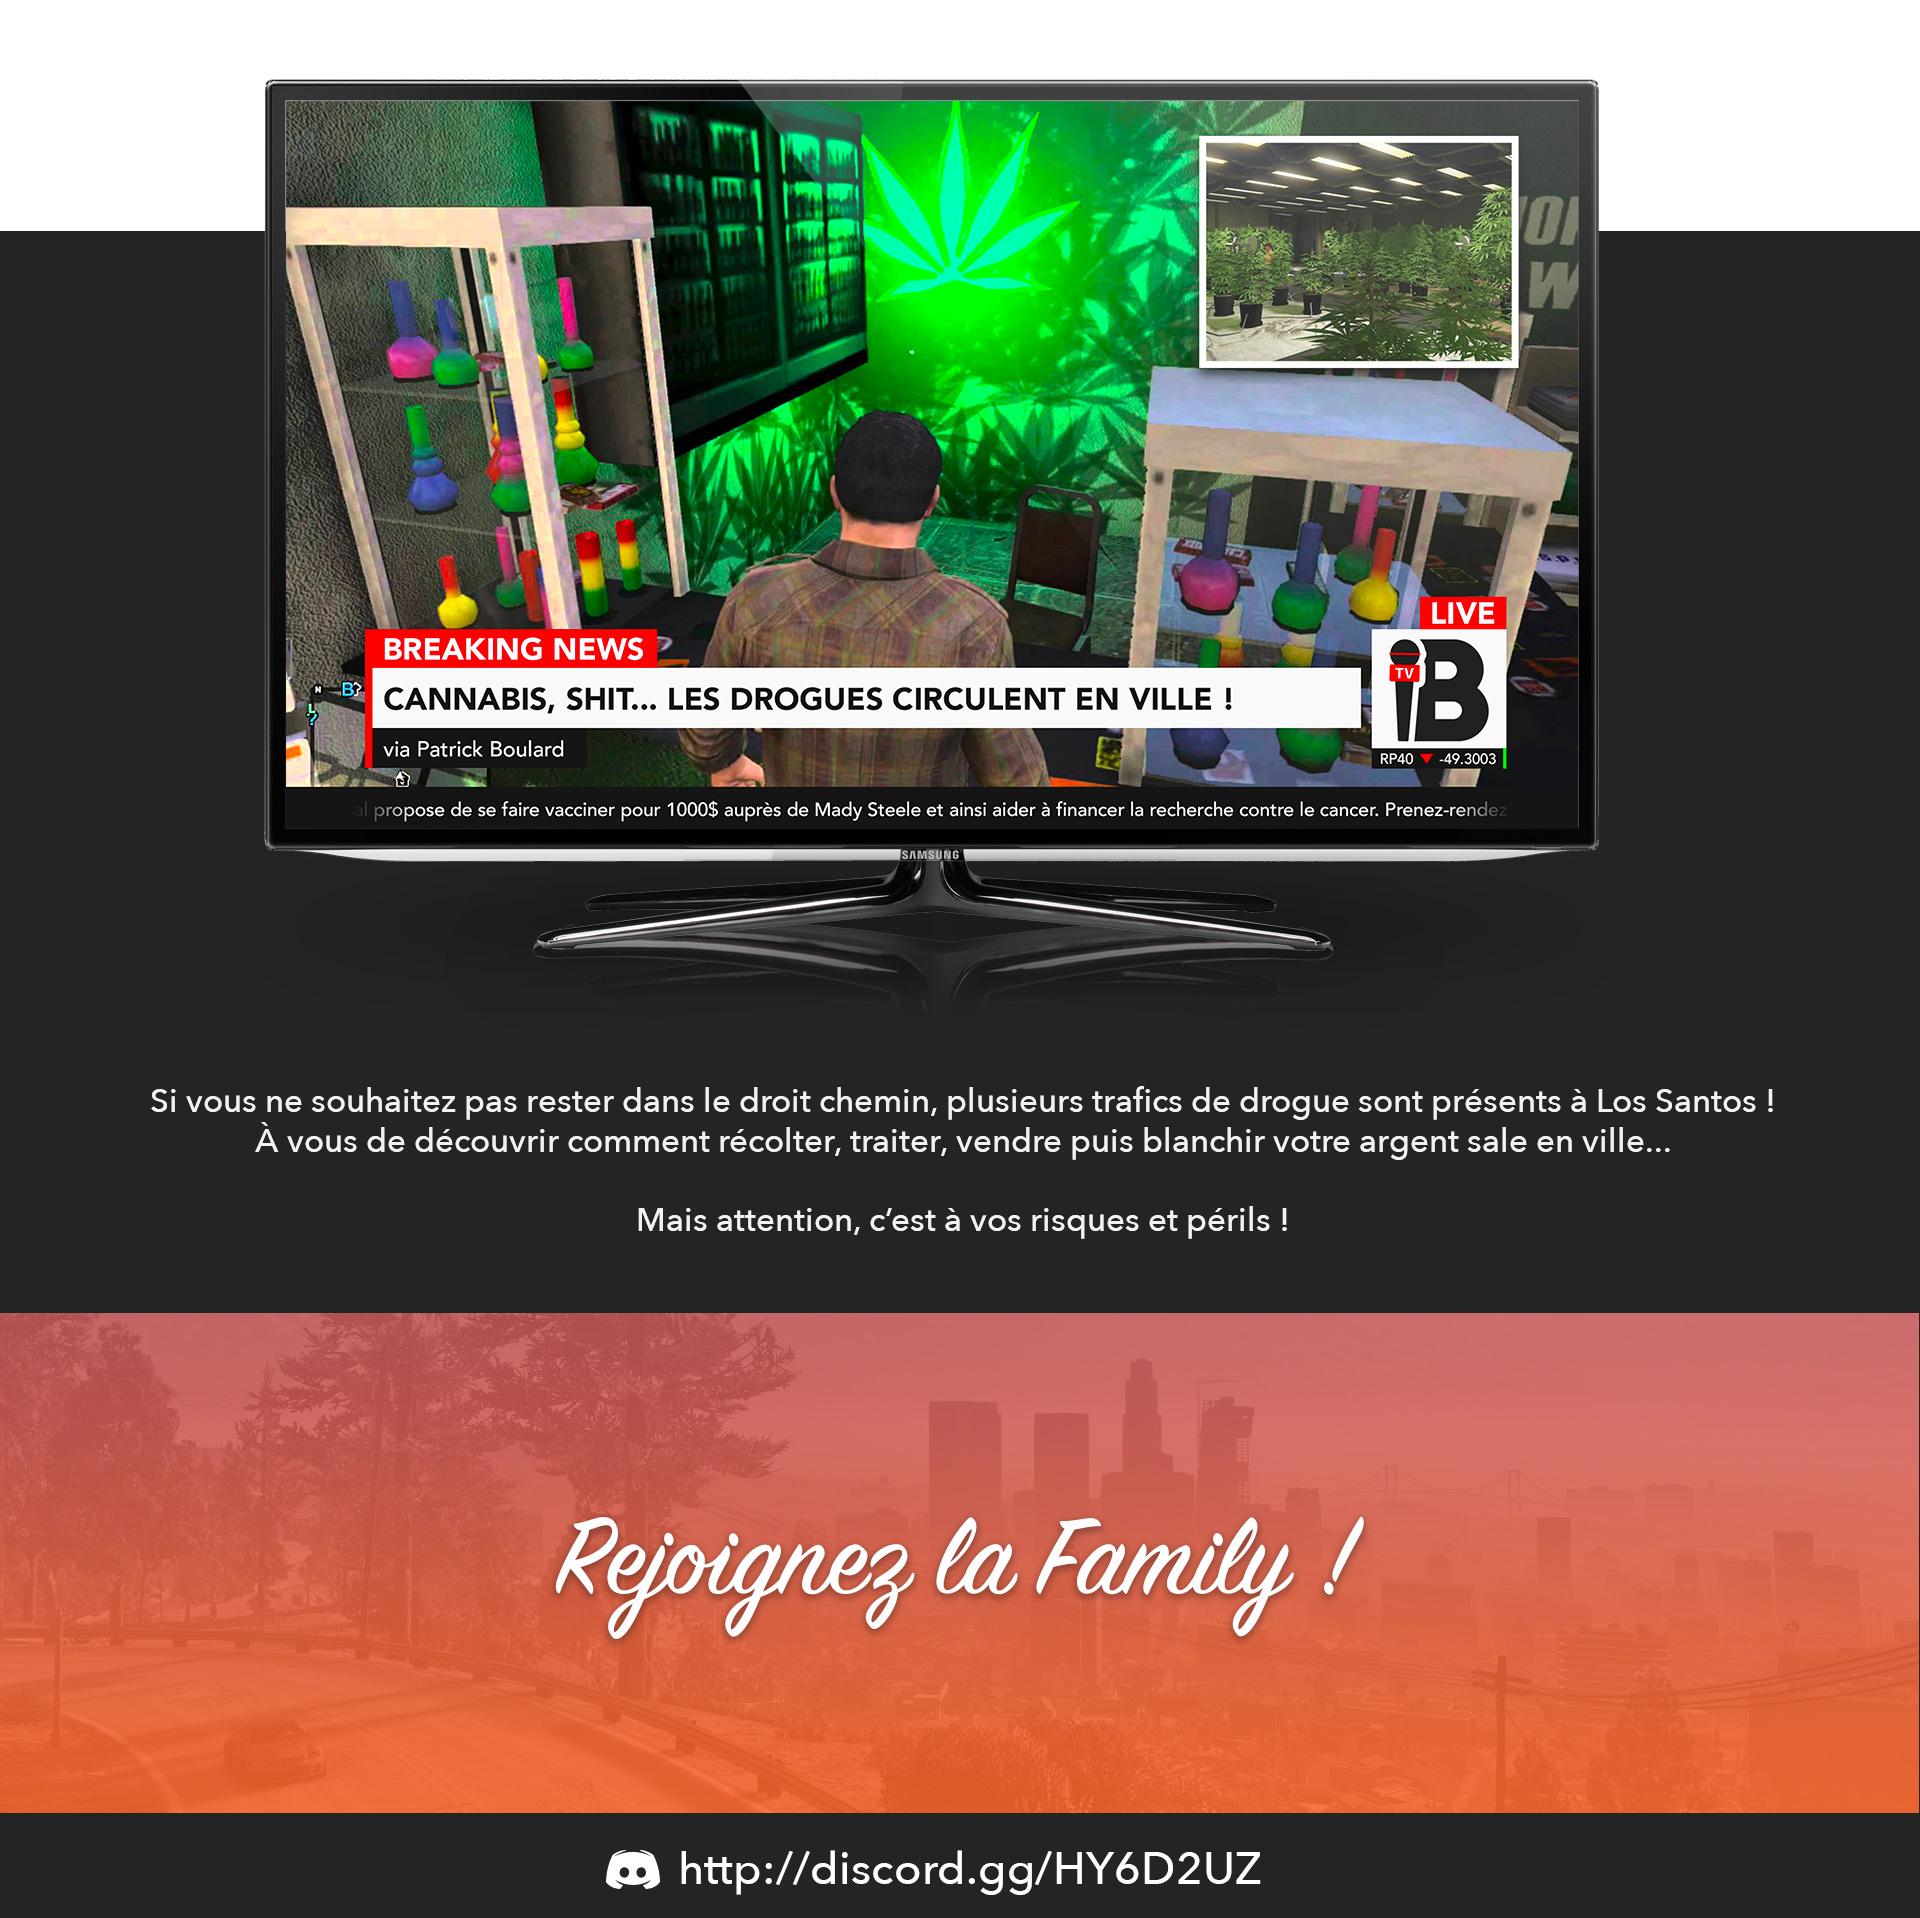 5a973409672cf-presentation_family_05.jpg